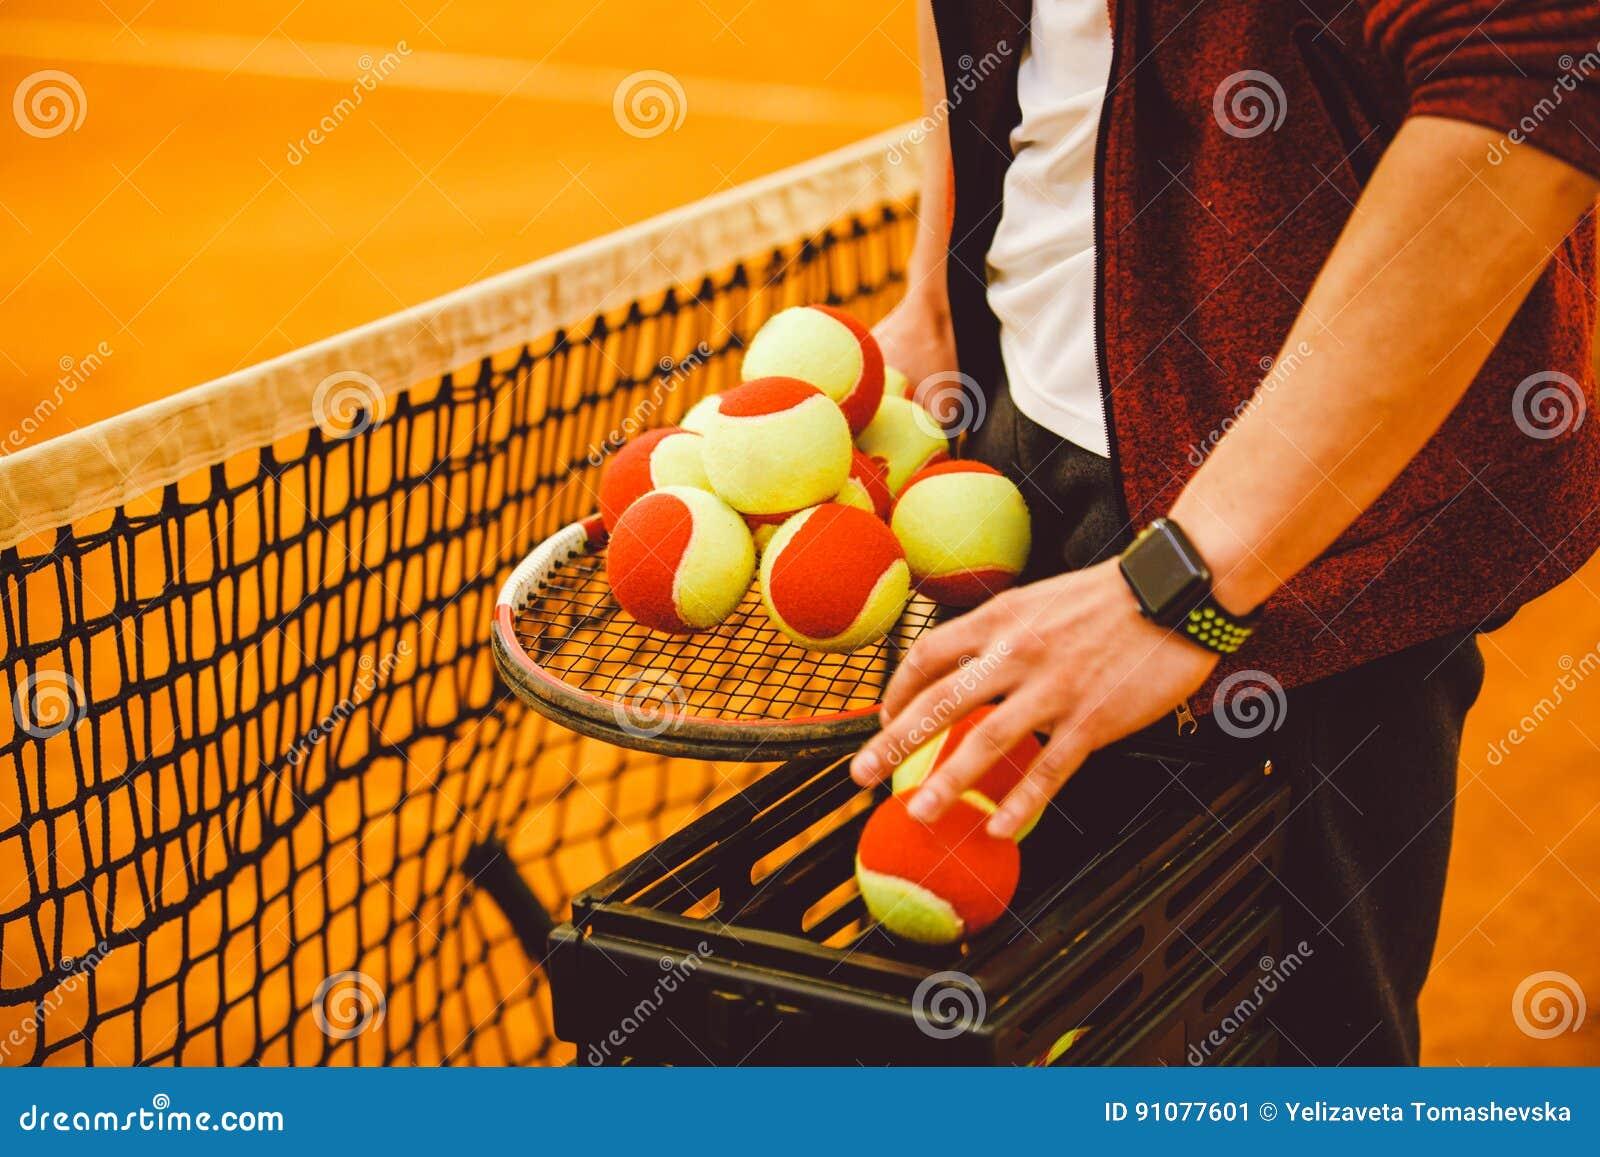 Hand man holding a tennis racket and a lot of goals. Basket for tennis balls,